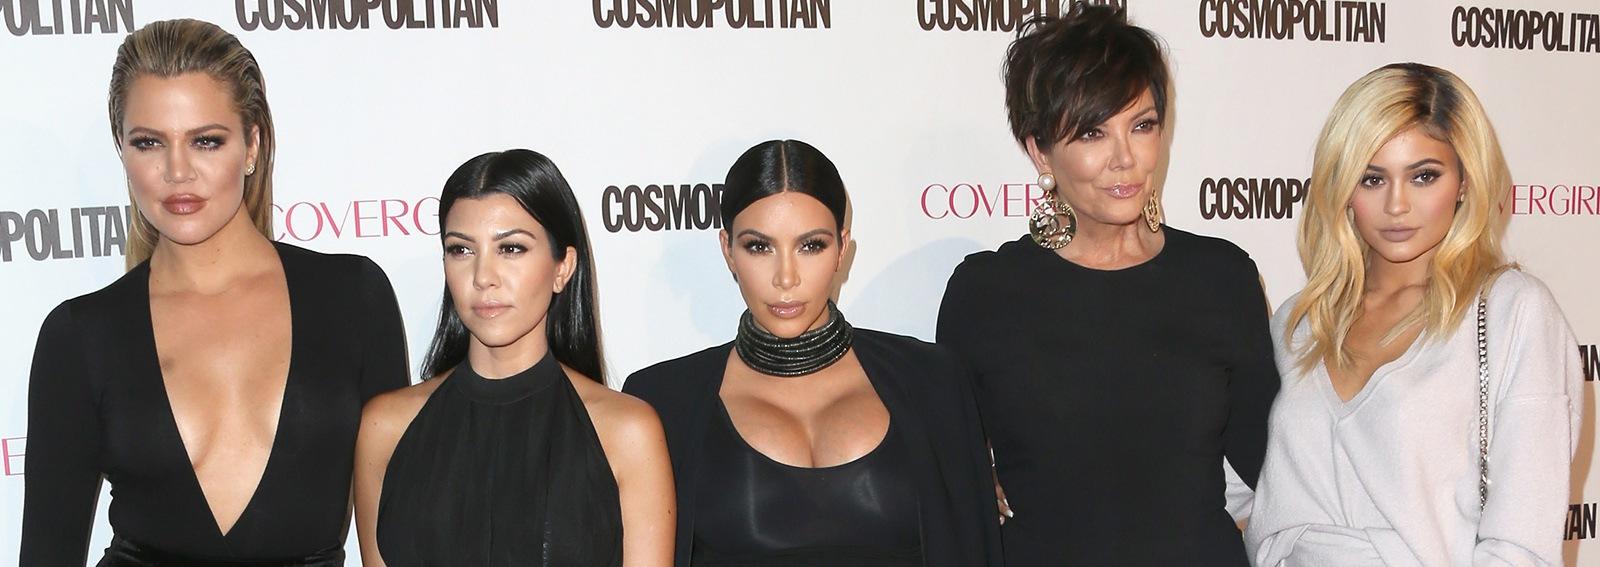 cover famiglia kardashian ieri oggi chirurgia desktop